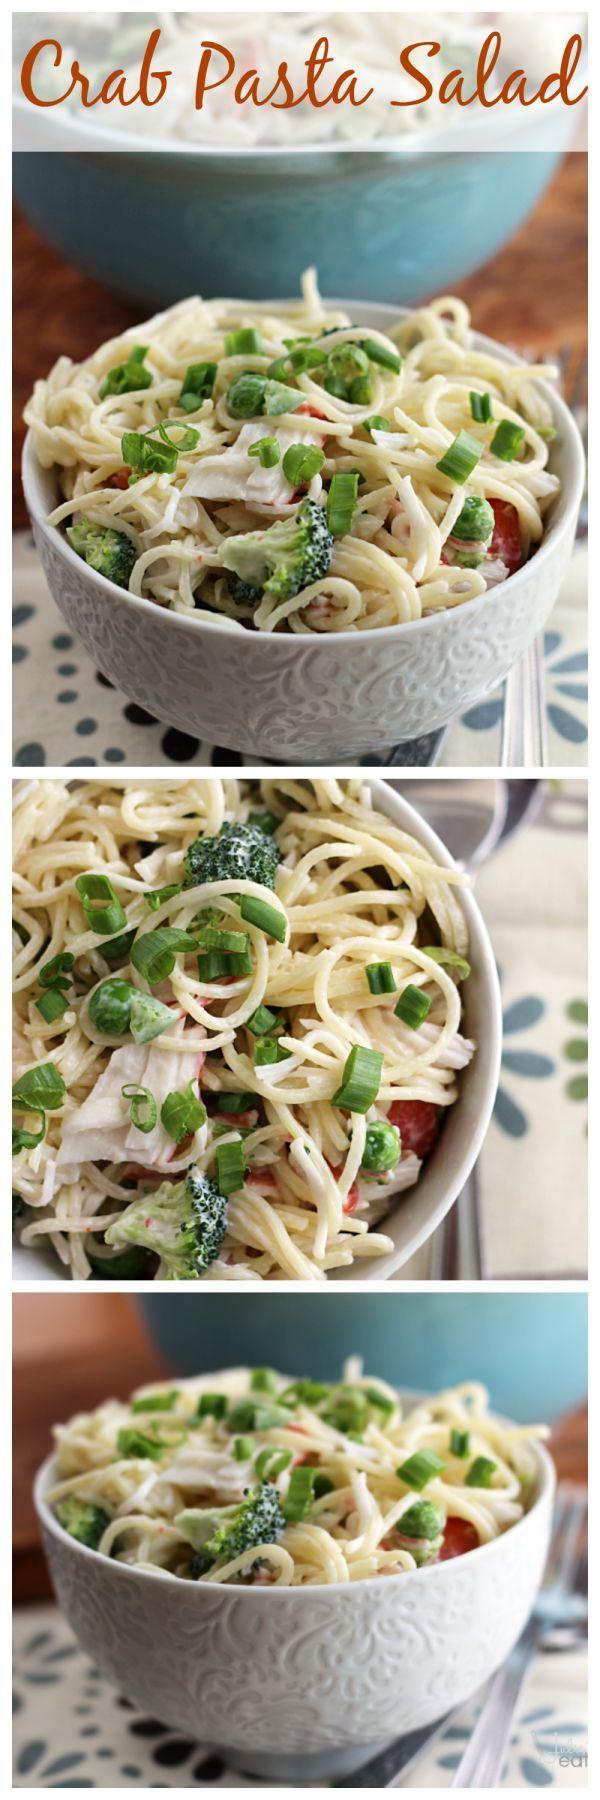 Crab Pasta Salad ~ Pasta Salad Loaded with Crab Meat, Peas, Broccoli ...